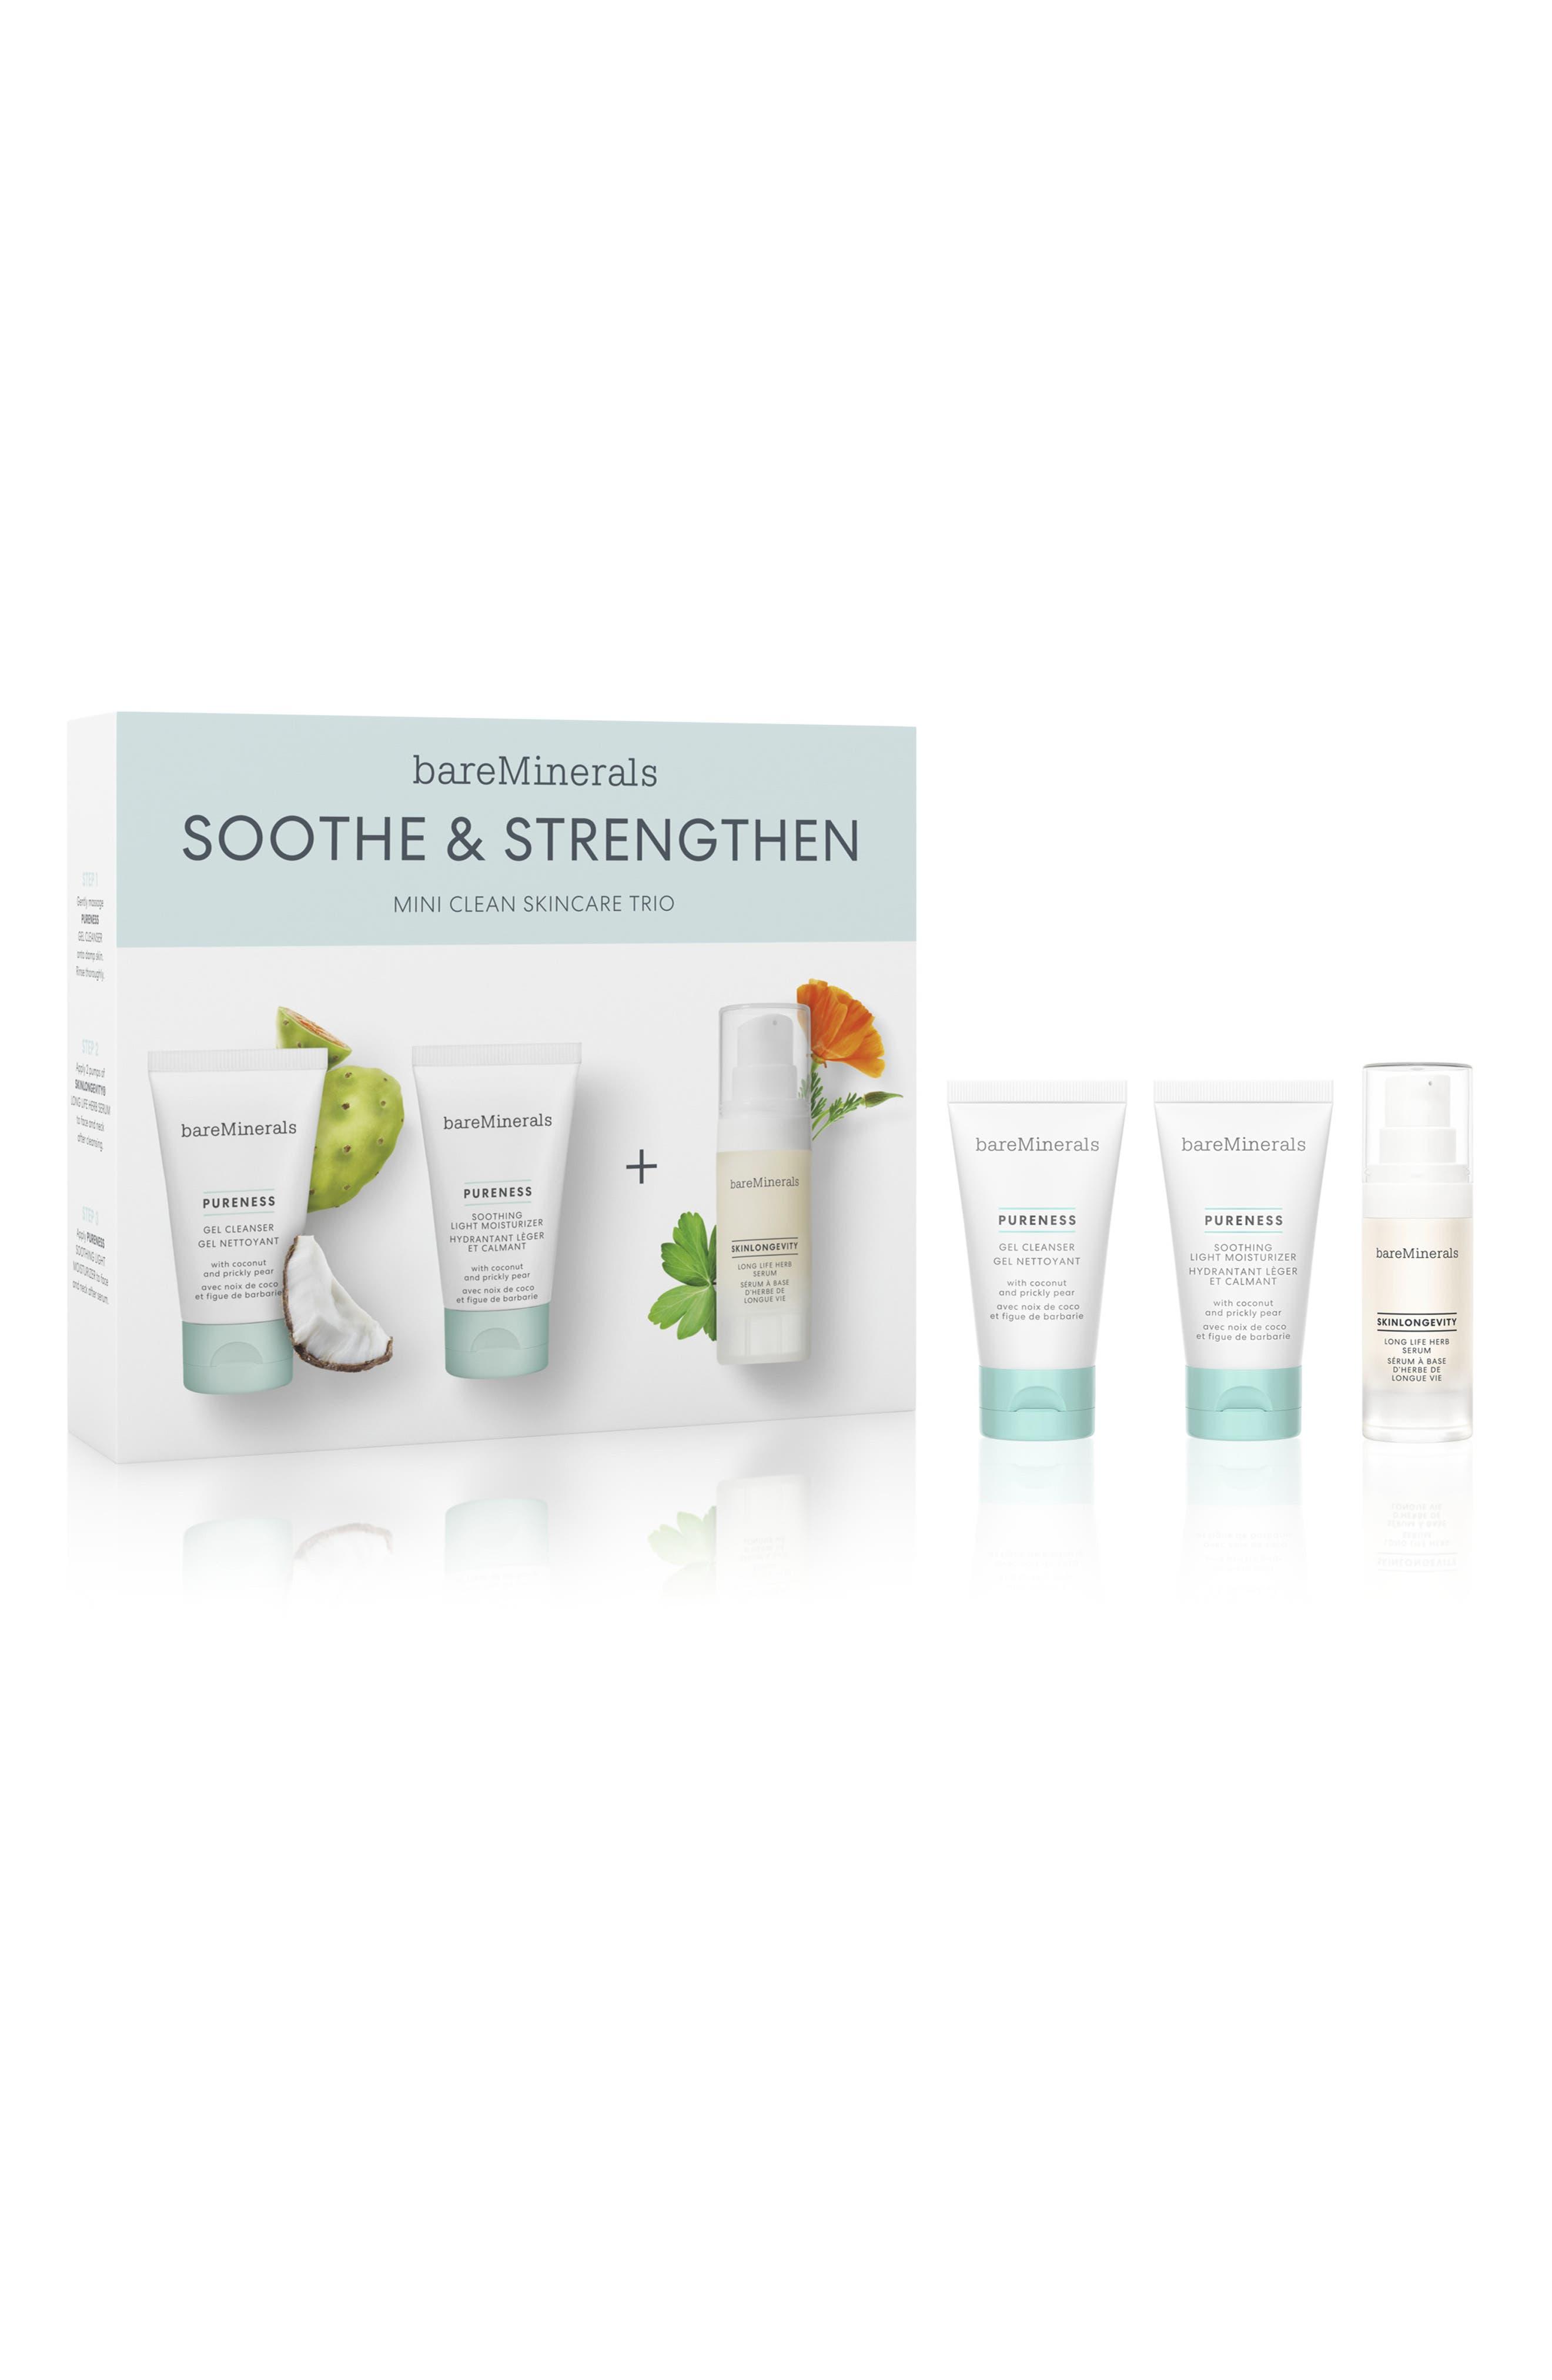 Bareminerals Soothe & Strengthen Travel Size Skin Care Set